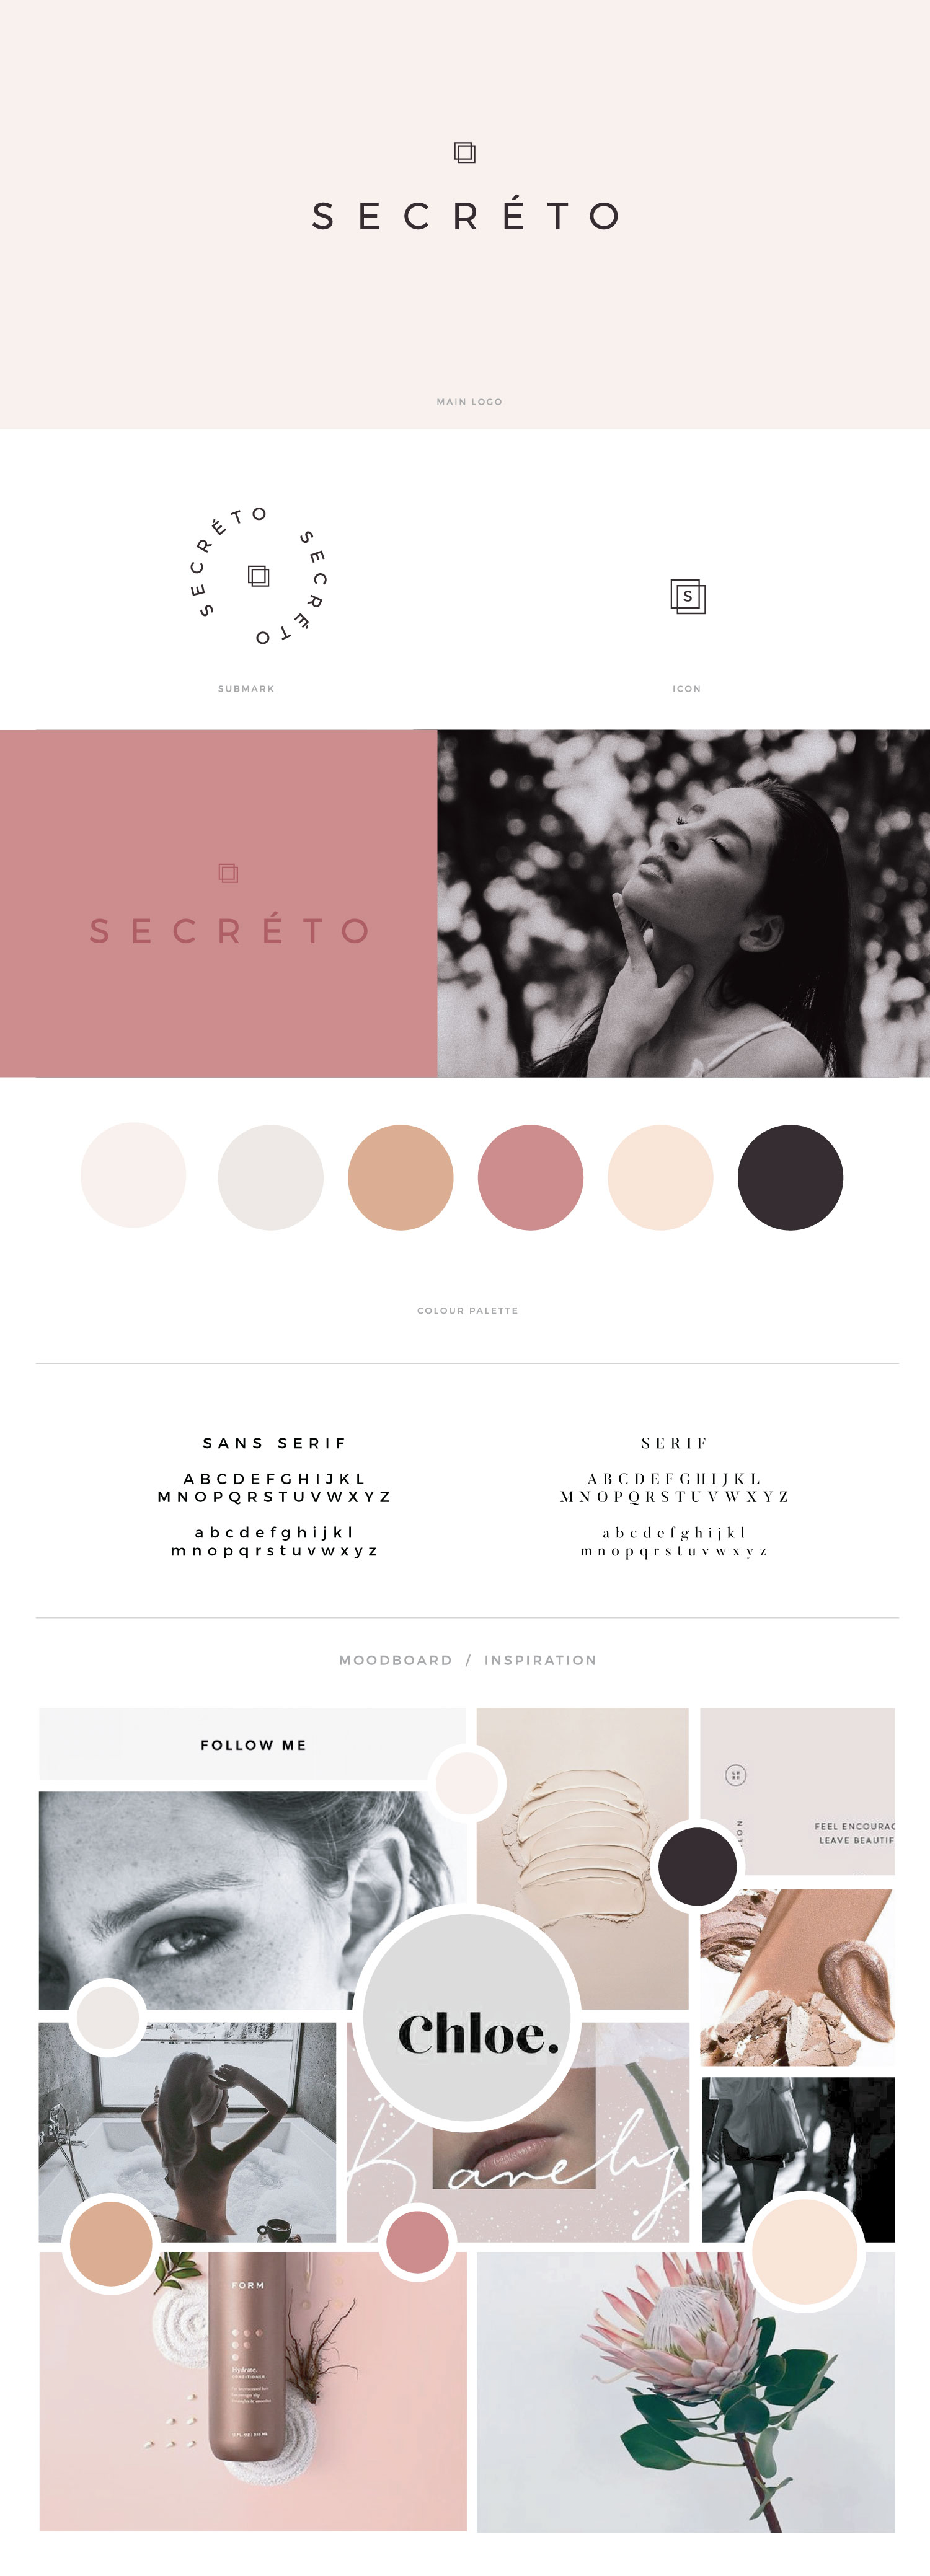 Secréto brandboard by January Made Design